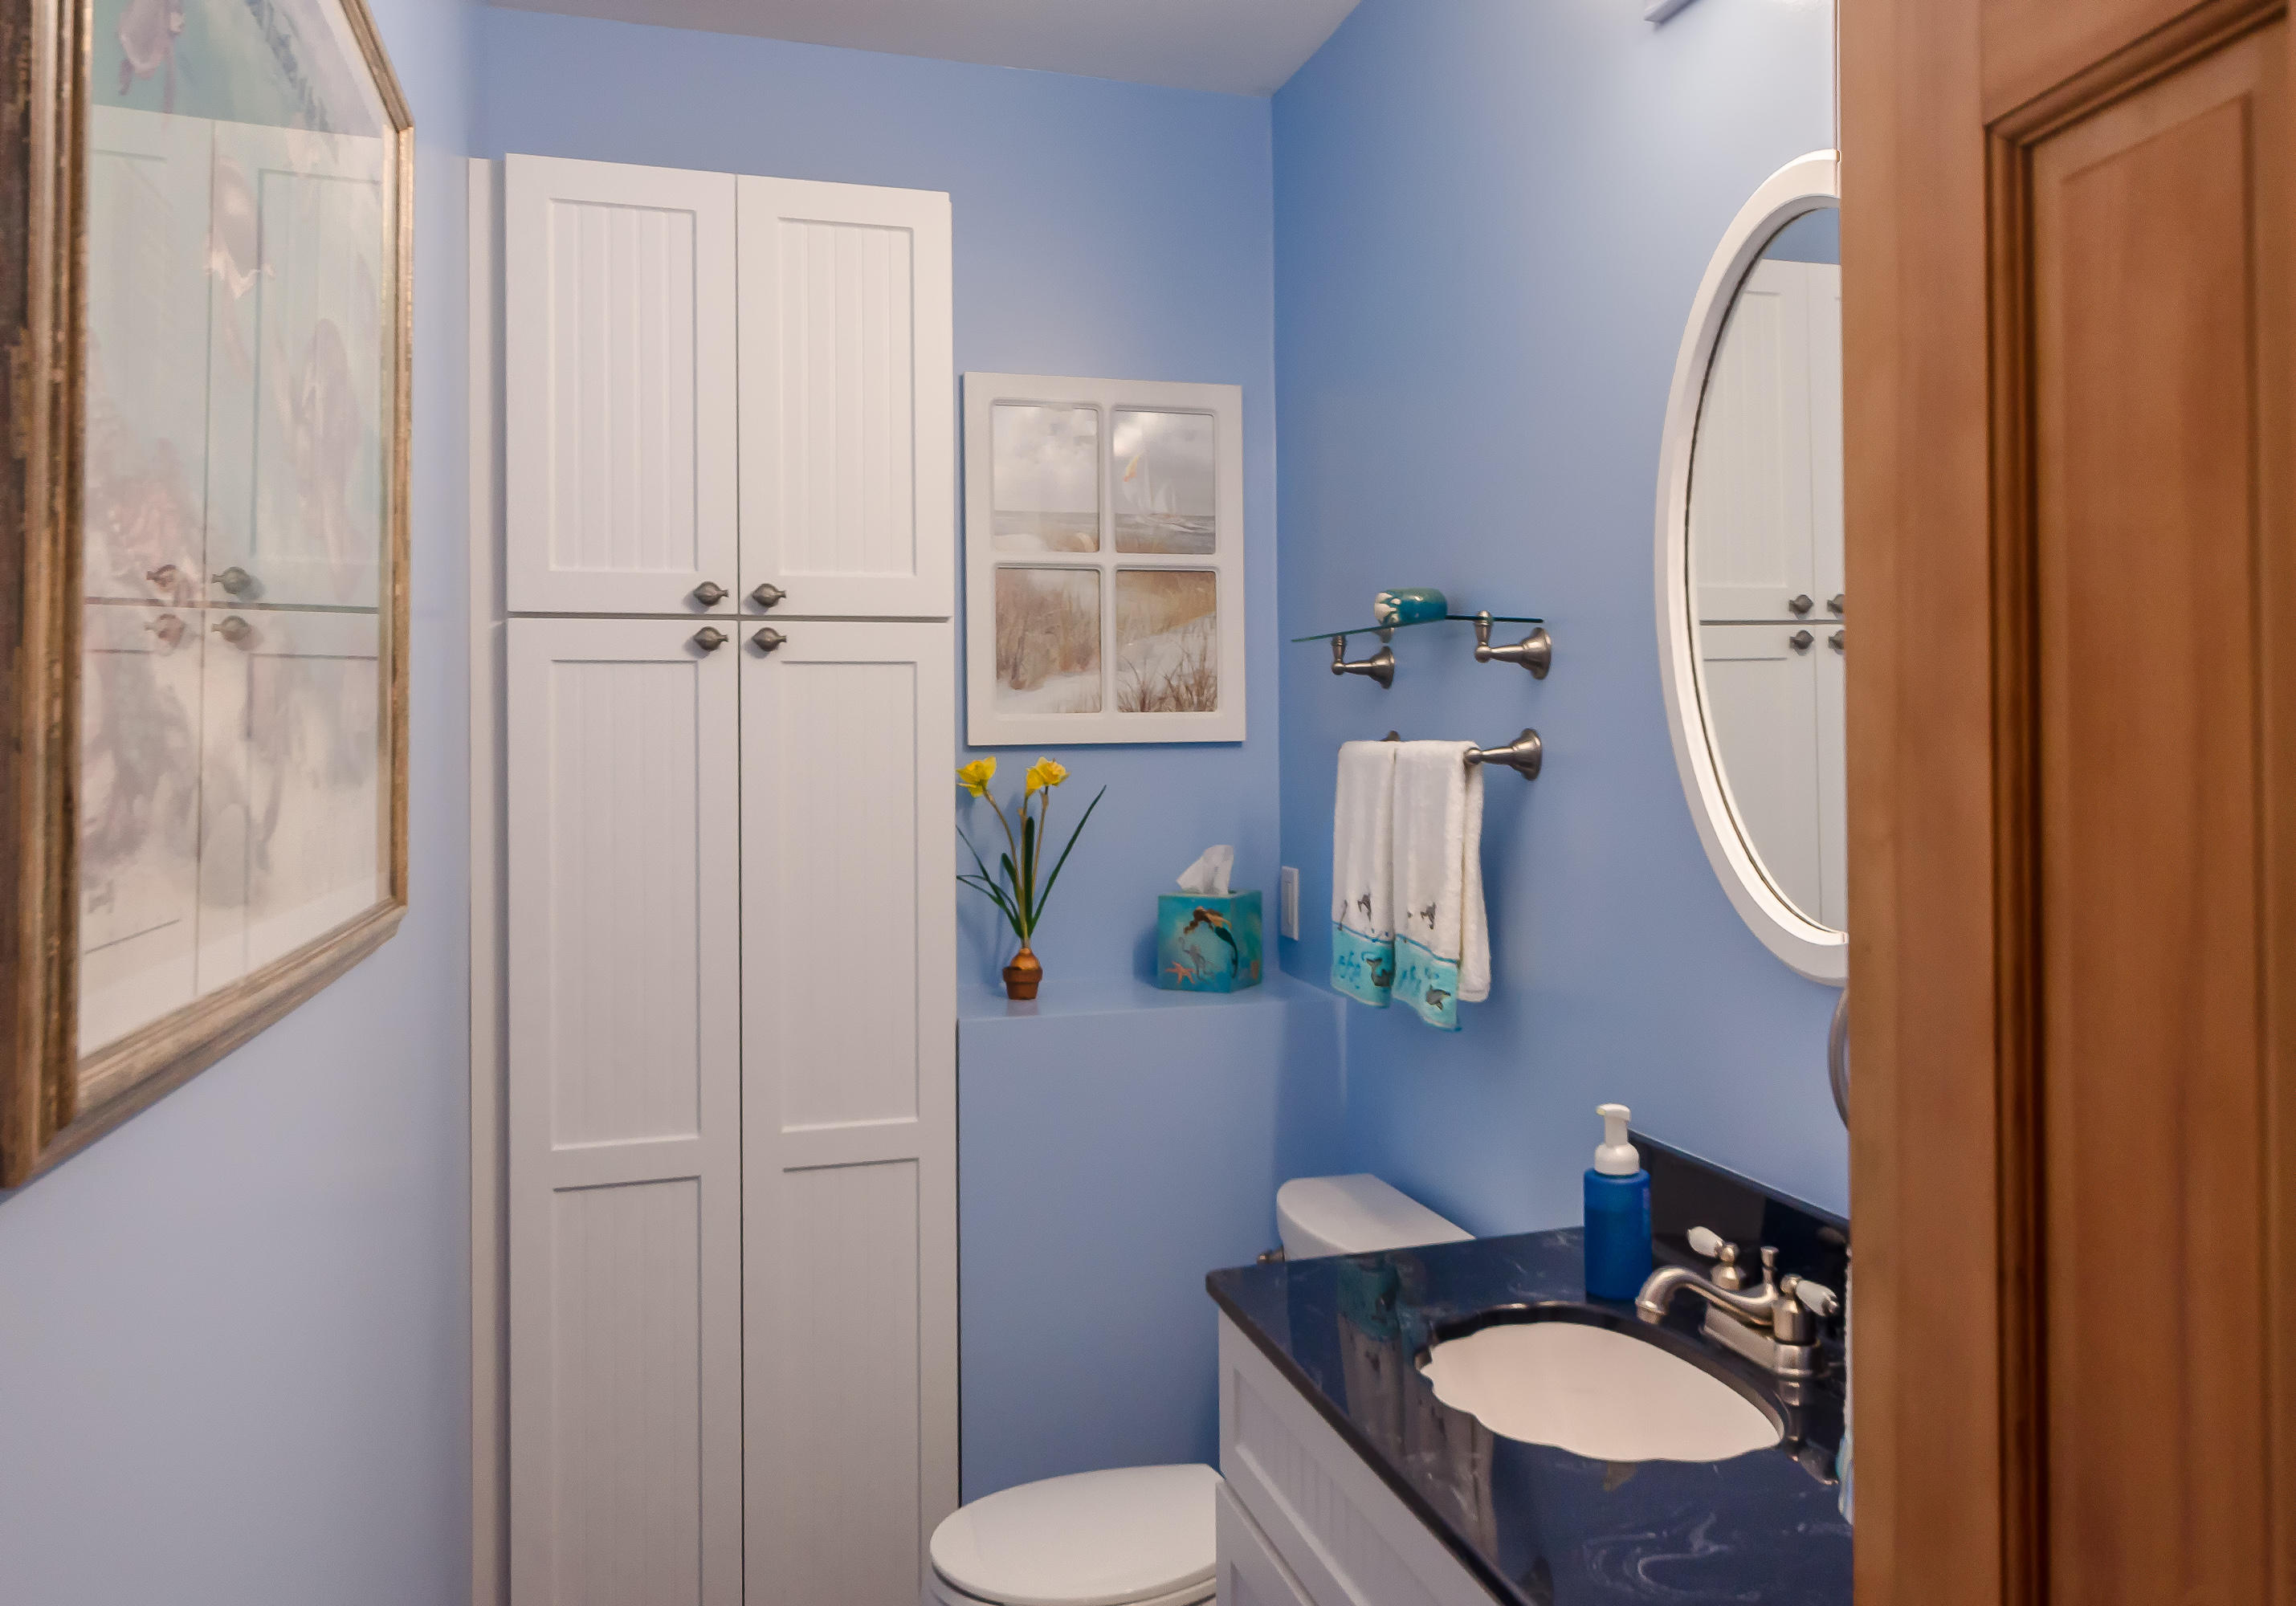 Kiawah Island Homes For Sale - 597 Oyster Rake, Kiawah Island, SC - 10